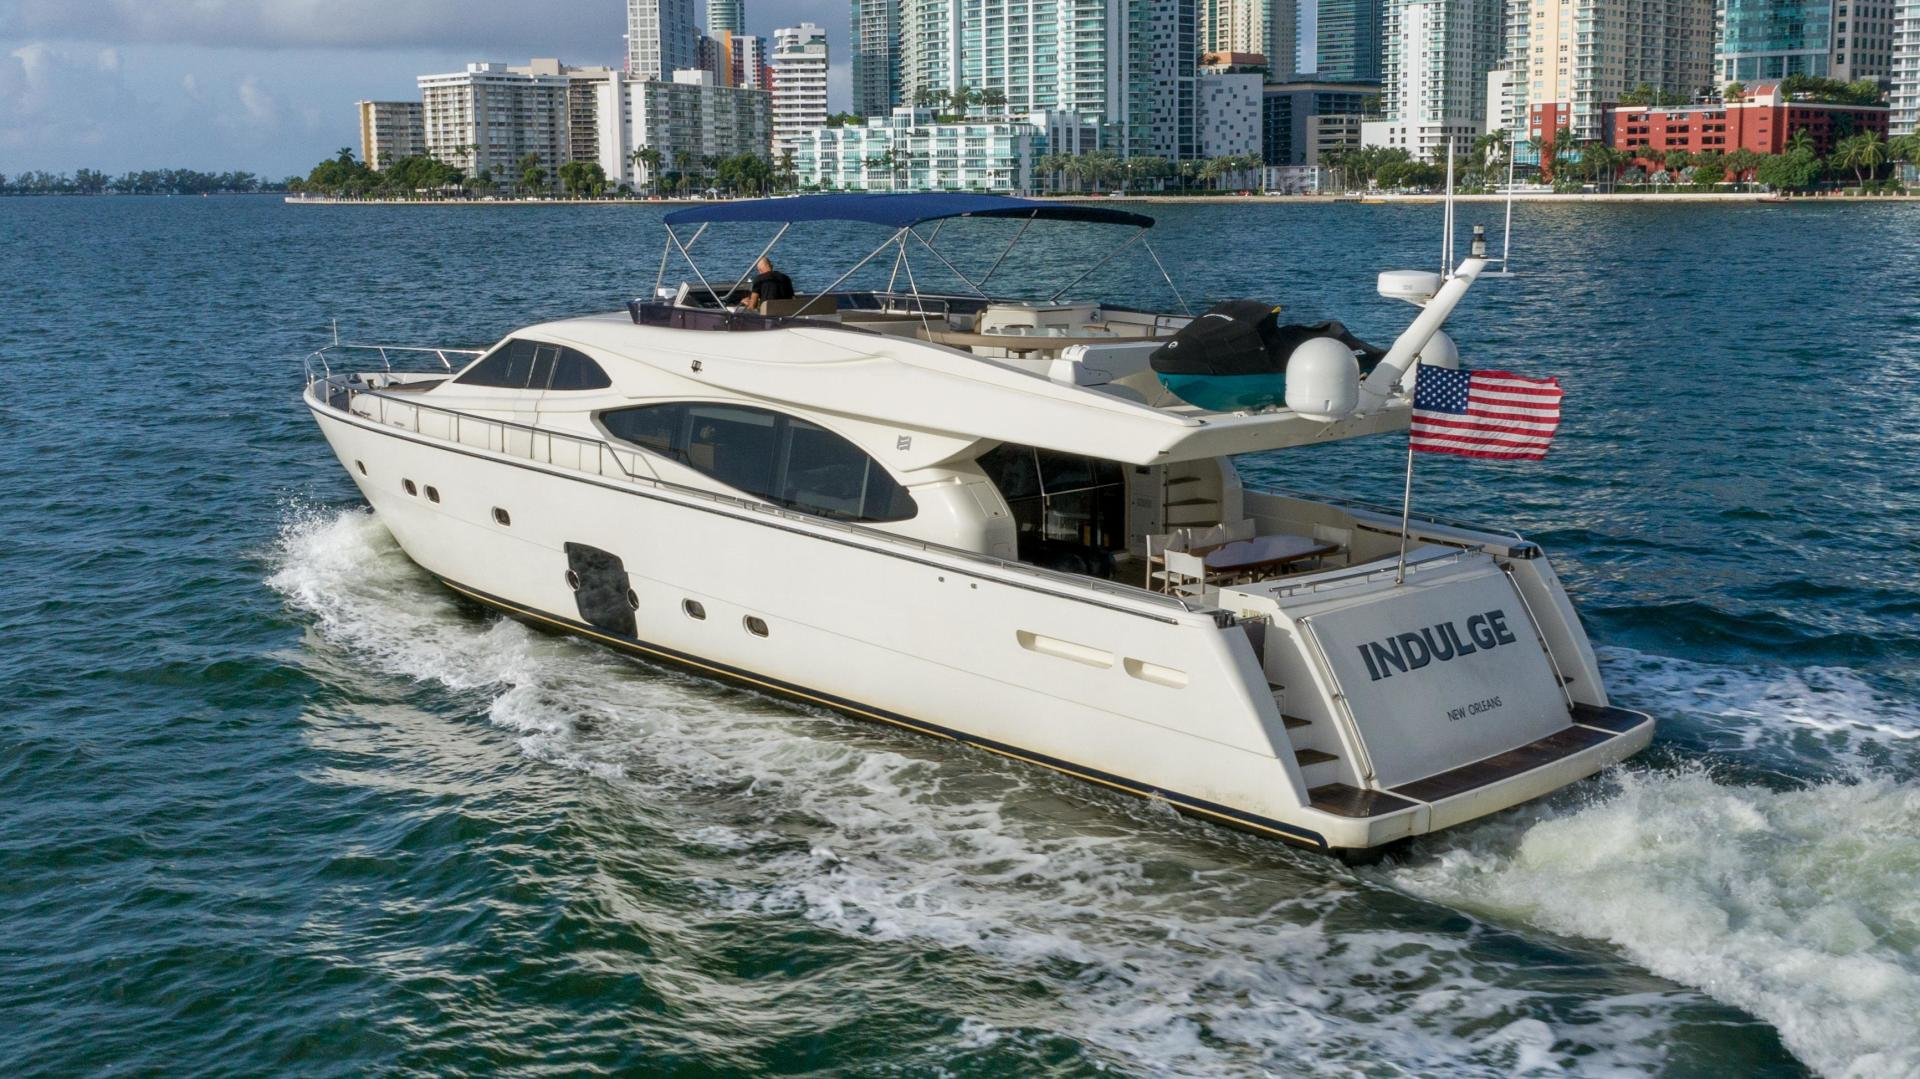 Ferretti Yachts-780 Fly bridge 2007-INDULGE Miami-Florida-United States-1544071 | Thumbnail